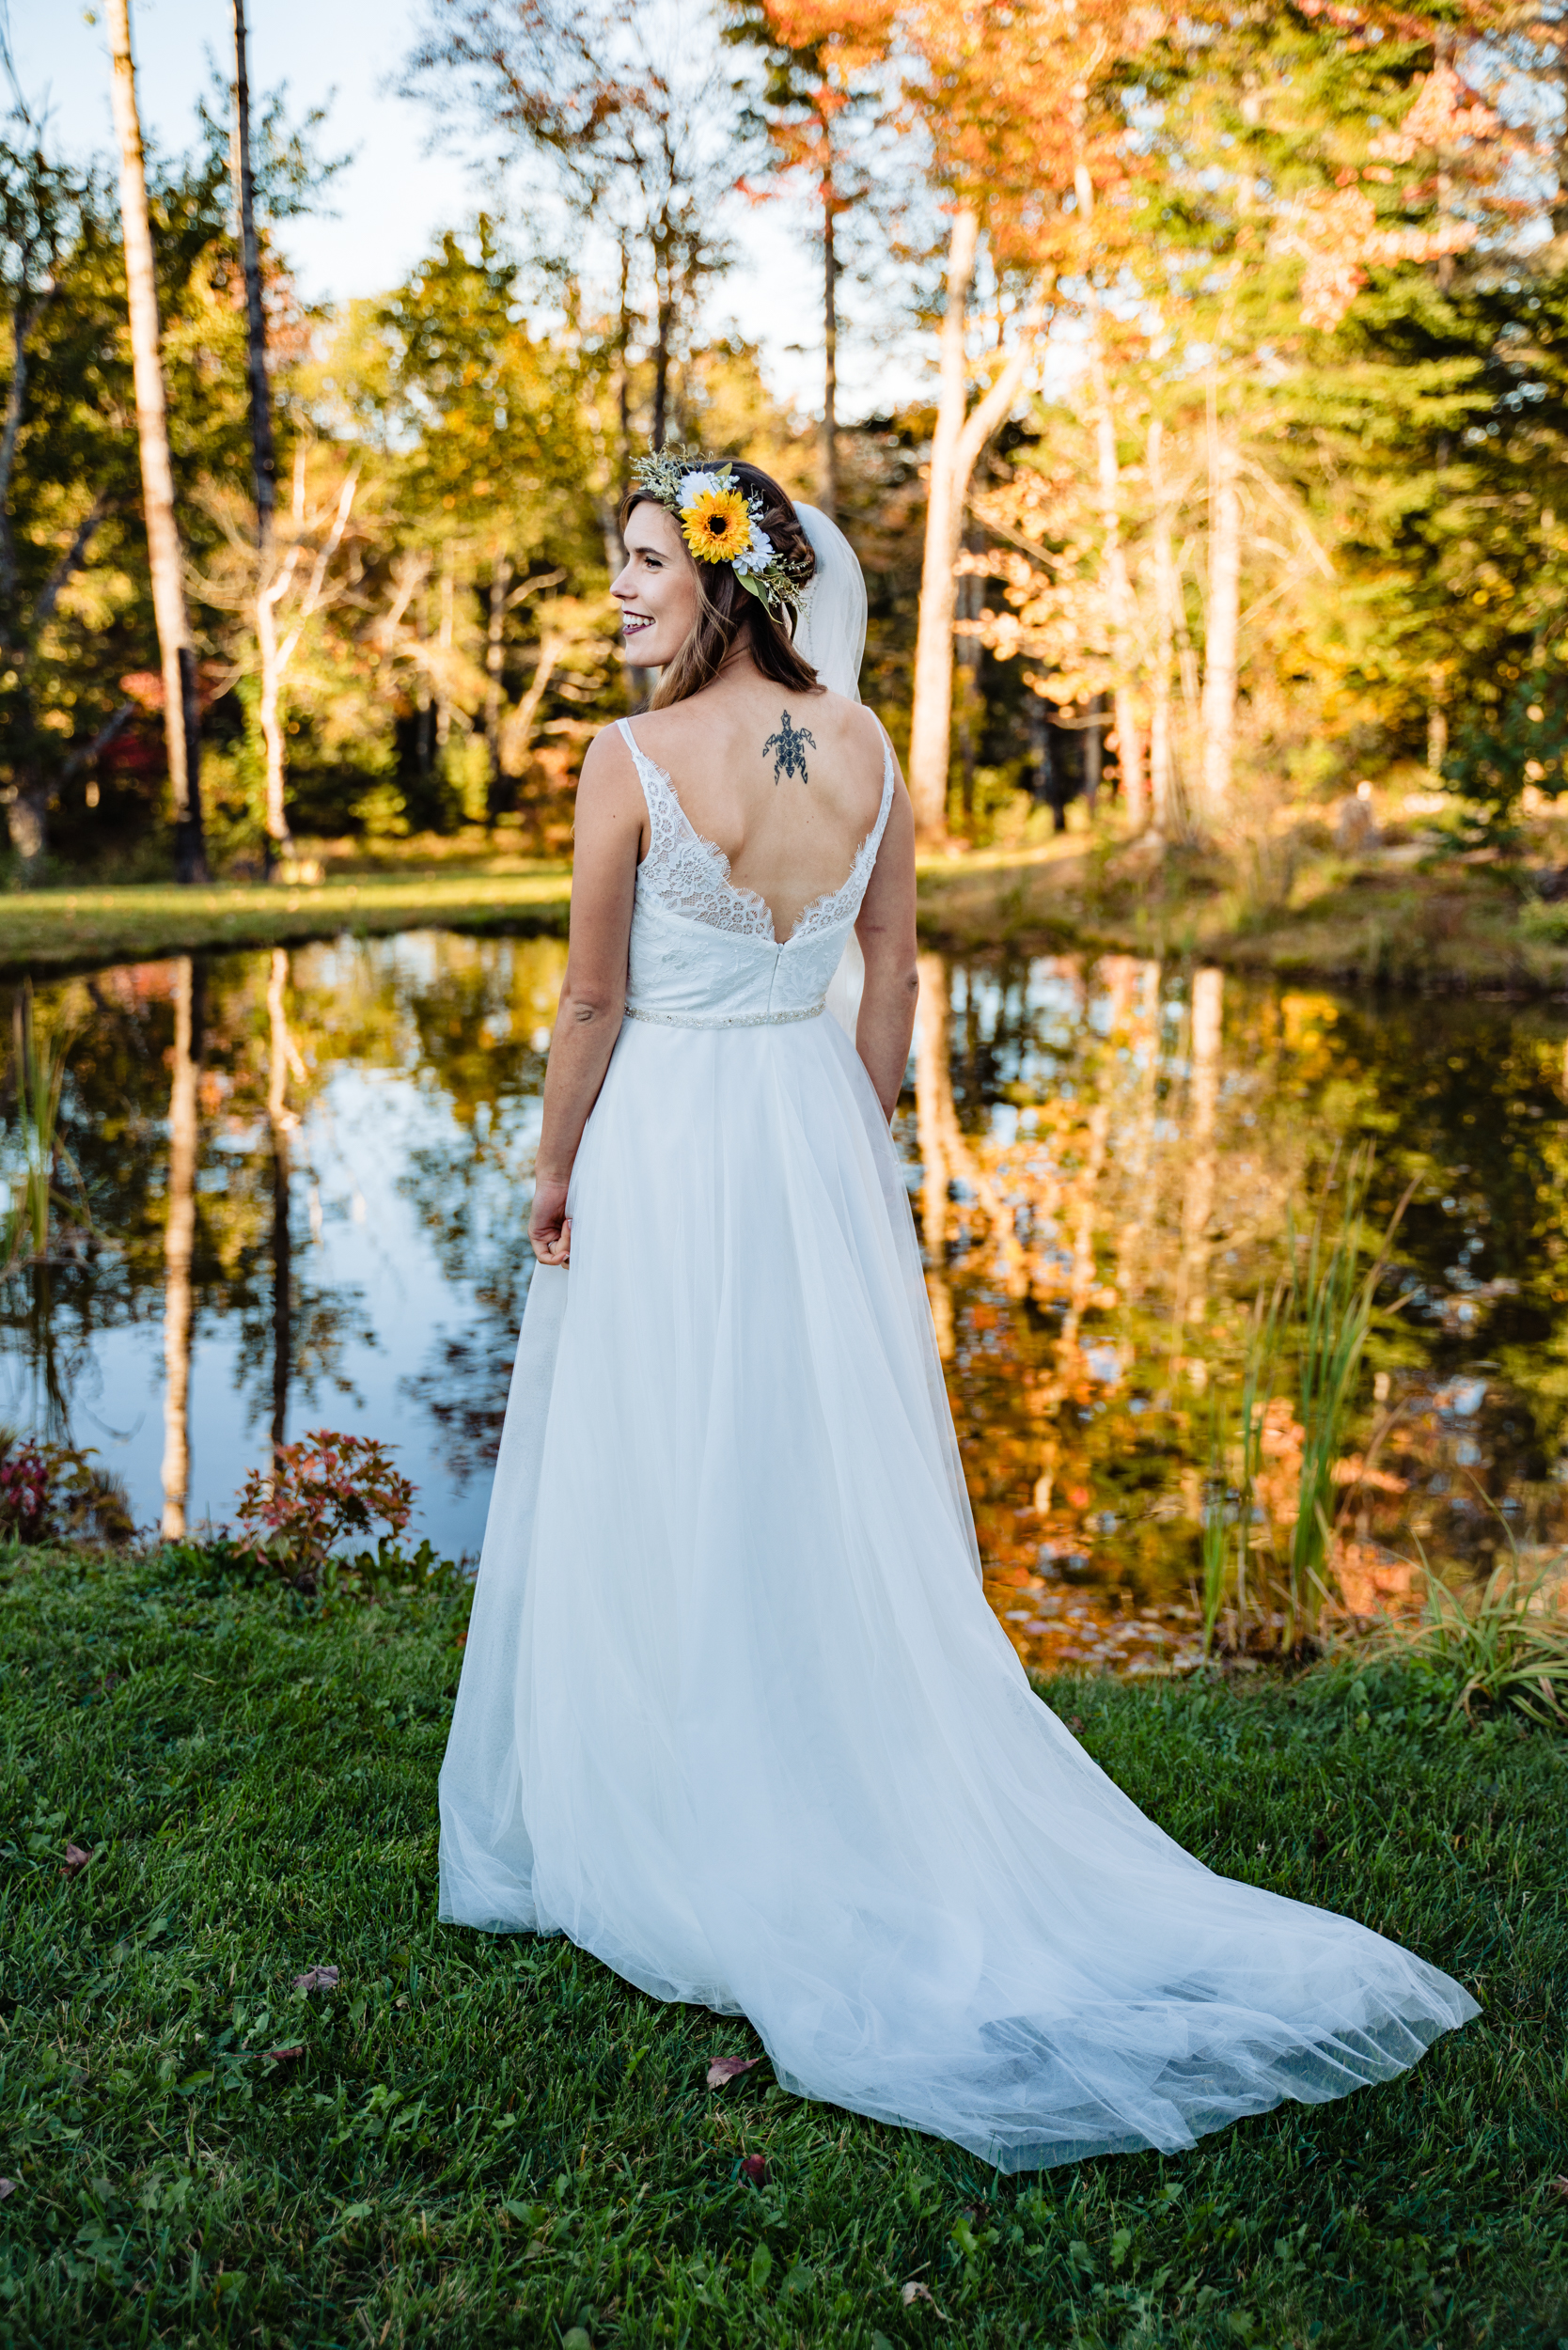 Halifax-wedding-photography-fall-photographers-novascotia-canada-ottawa (86 of 97).jpg